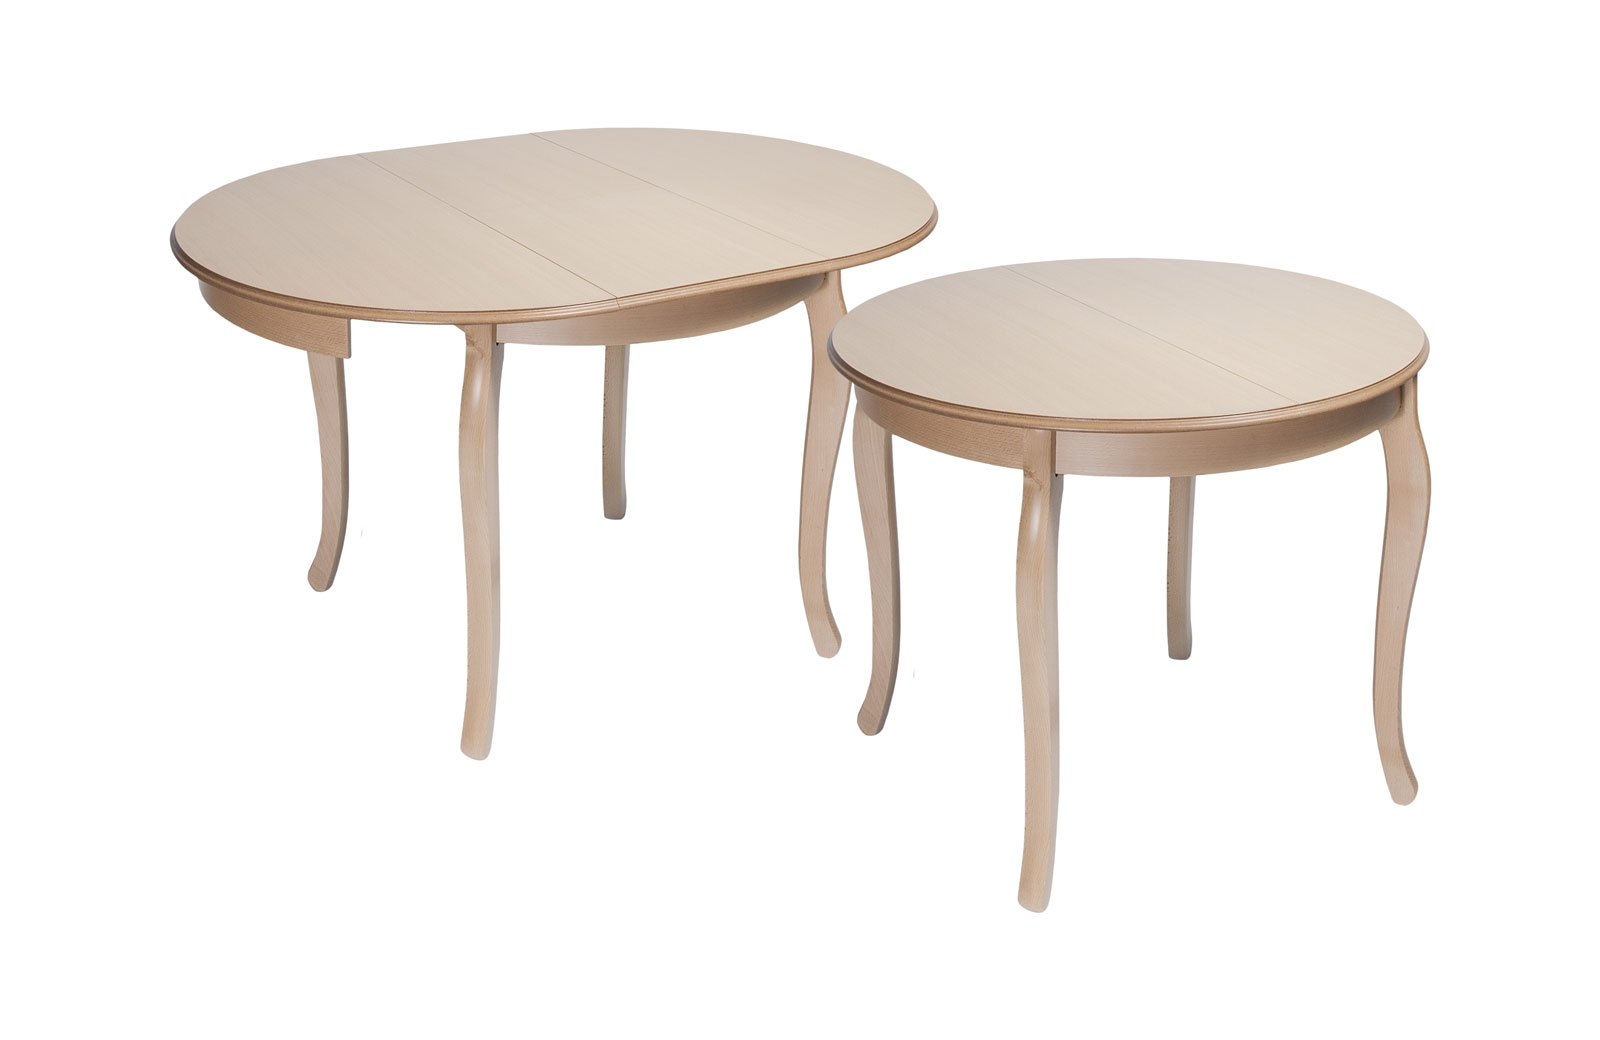 Стол обеденный Азалия К 900 - 1